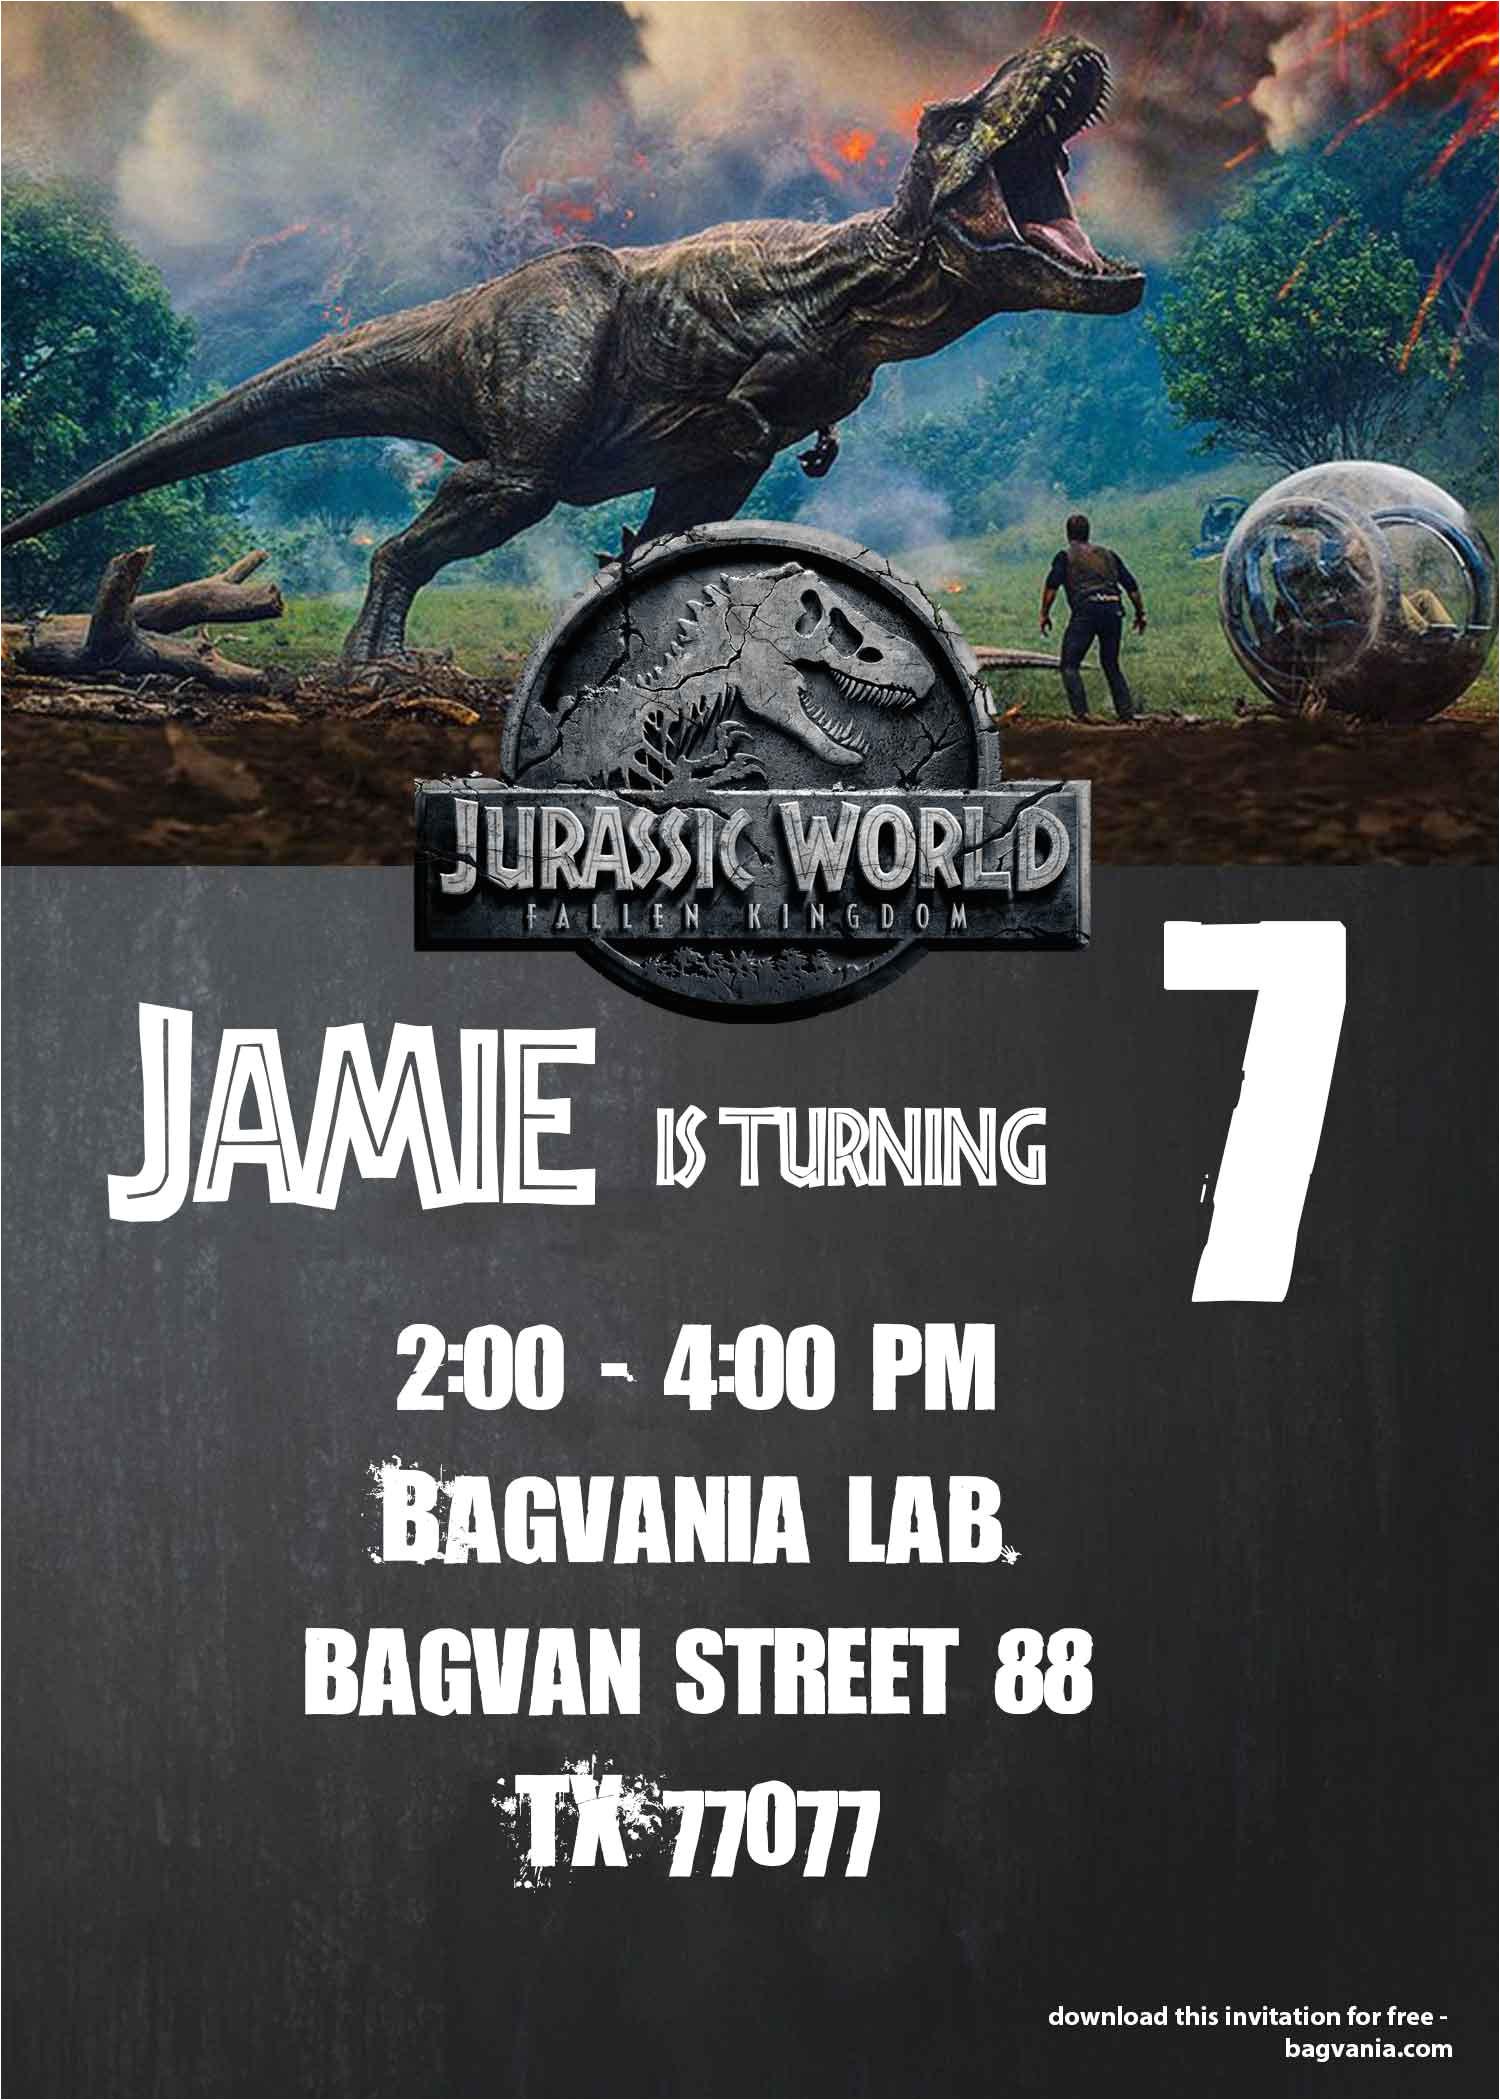 jurassic world fallen kingdom birthday party ideas free invitation included